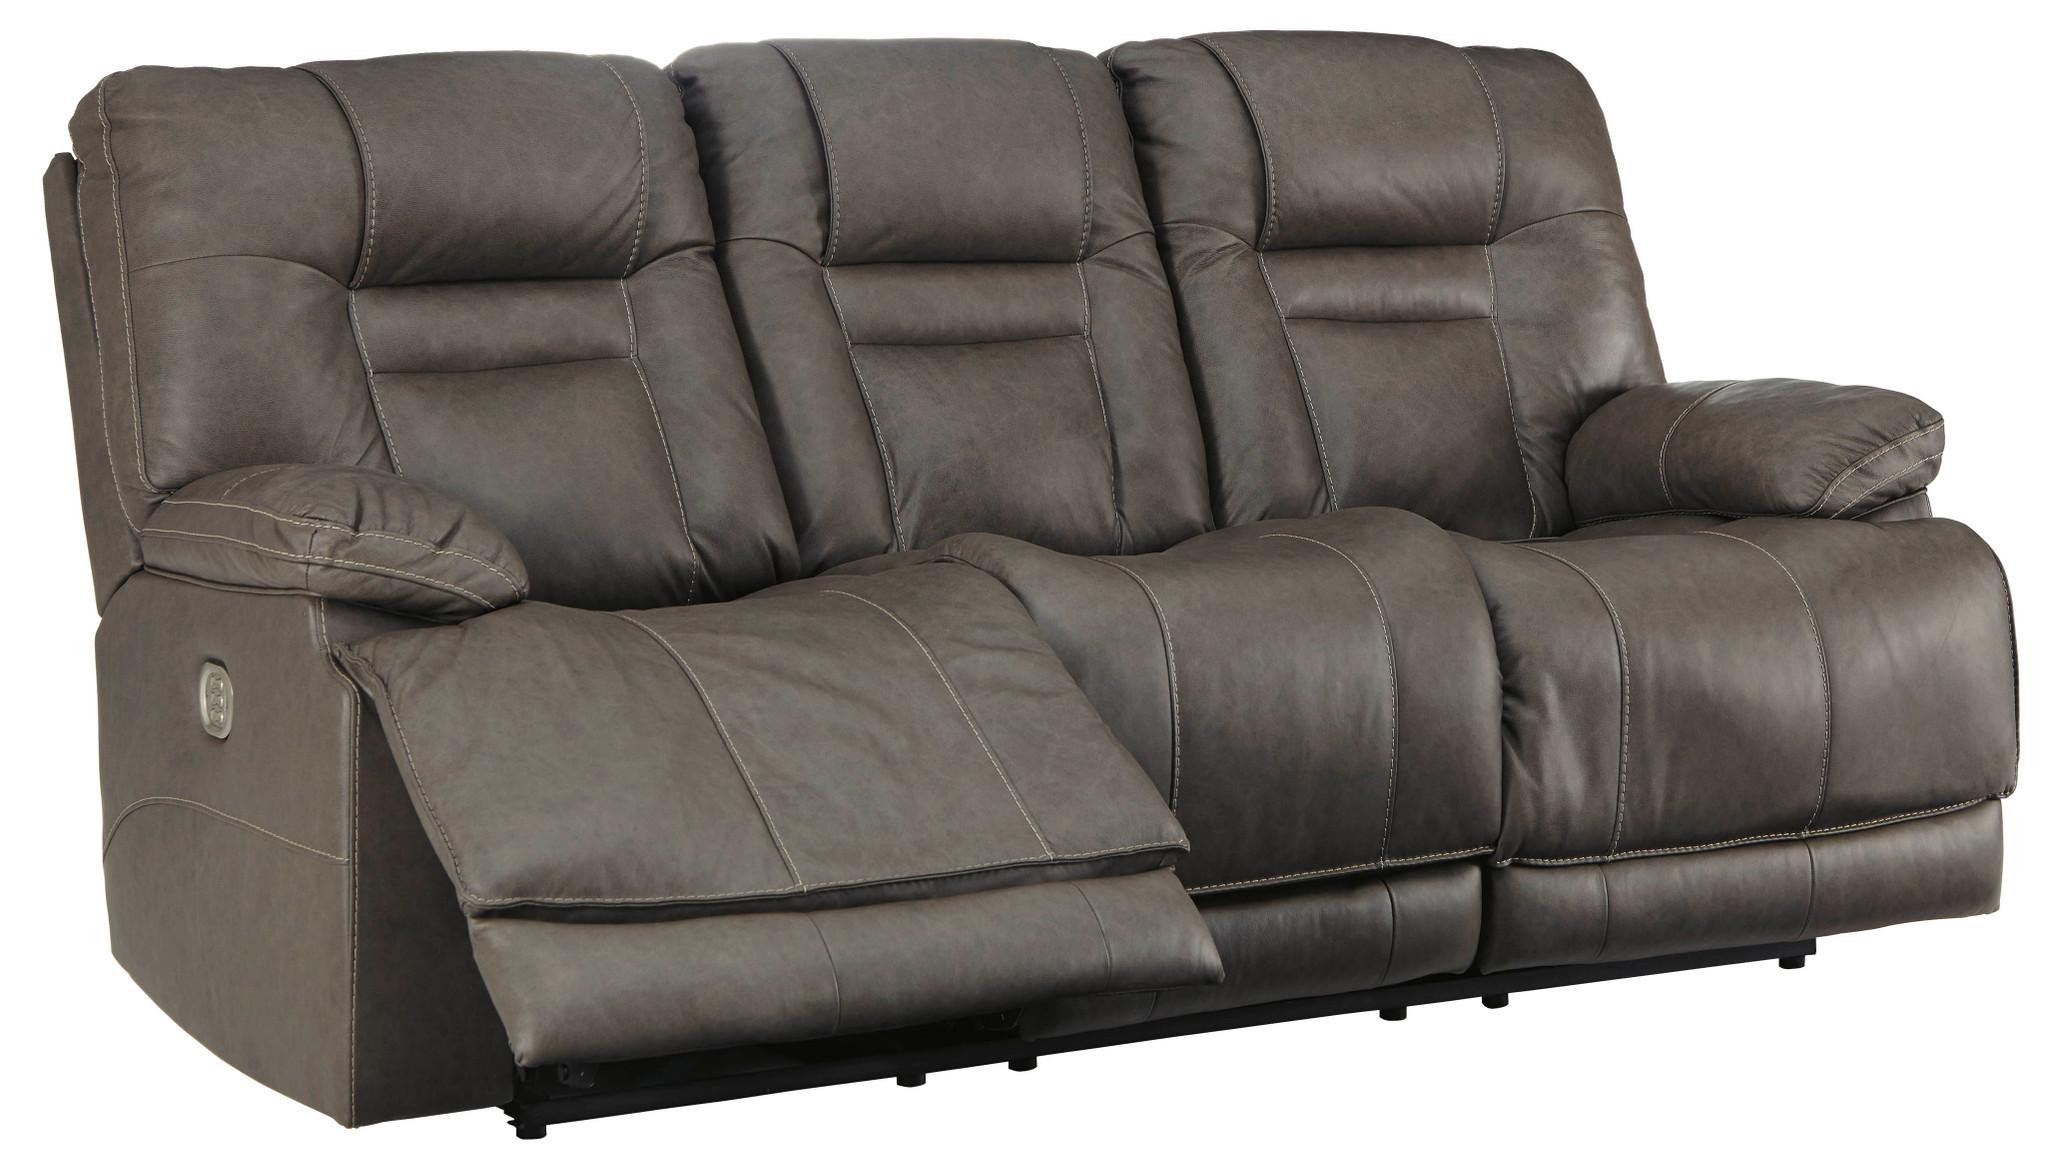 Peachy 2Pc Wurstrow Smoke Sofa And Loveseat Reclining Set Ibusinesslaw Wood Chair Design Ideas Ibusinesslaworg